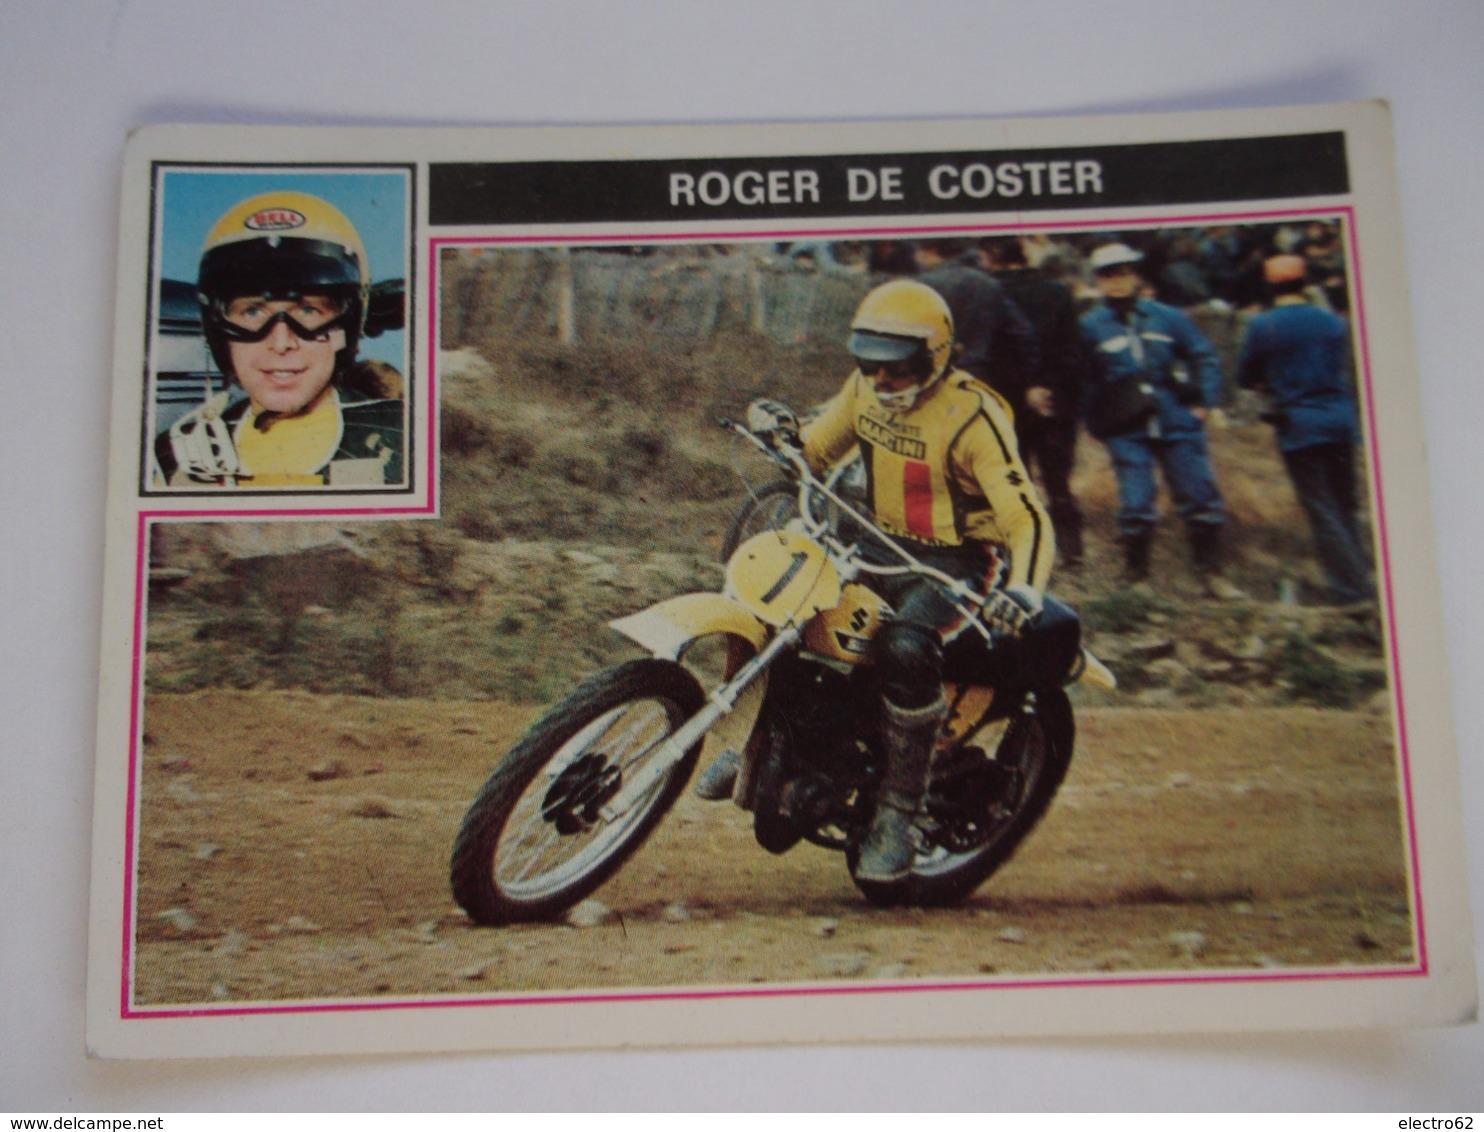 PANINI Super MOTO N°20 ROGER DE COSTER - Panini